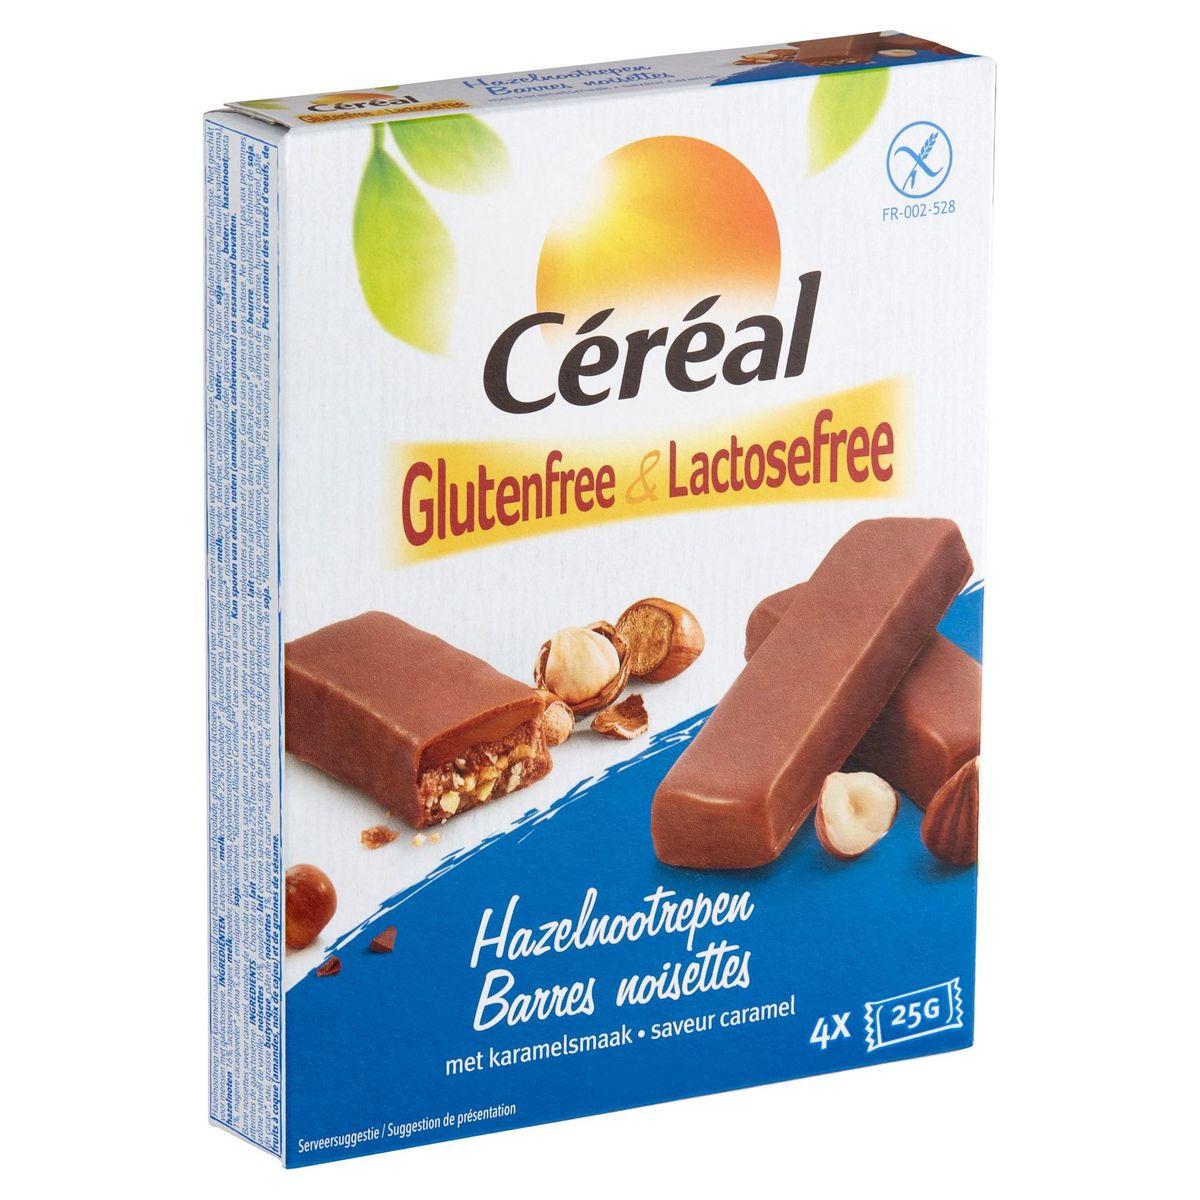 Céréal Glutenfree & Lactosefree Hazelnootrepen met Karamelsmaak 4 x 25 g